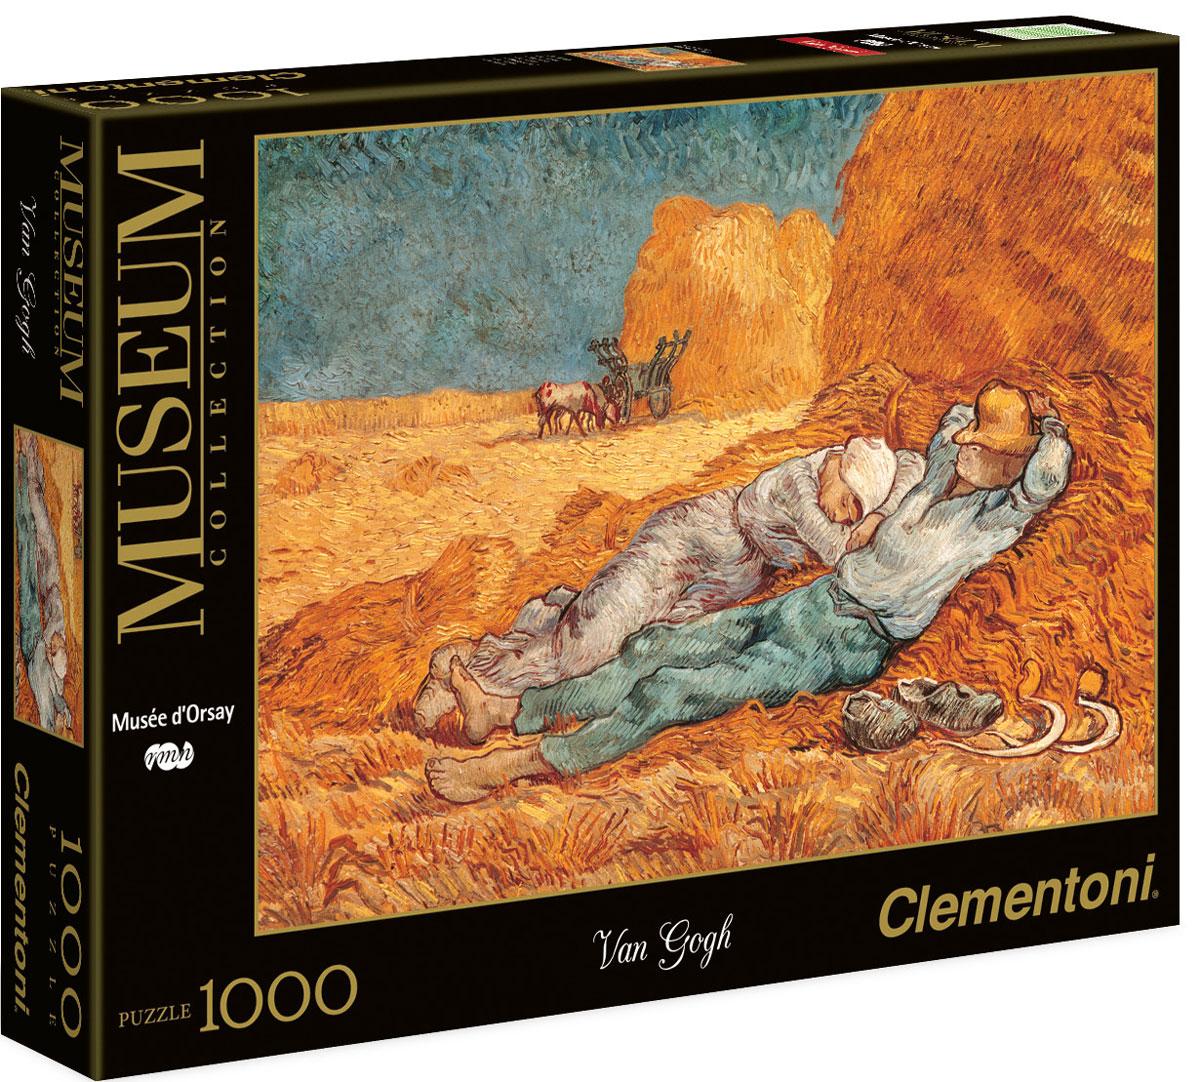 Clementoni Пазл Сиеста пазлы clementoni итальянский пазл clementoni серия музей микеланджело страшный суд